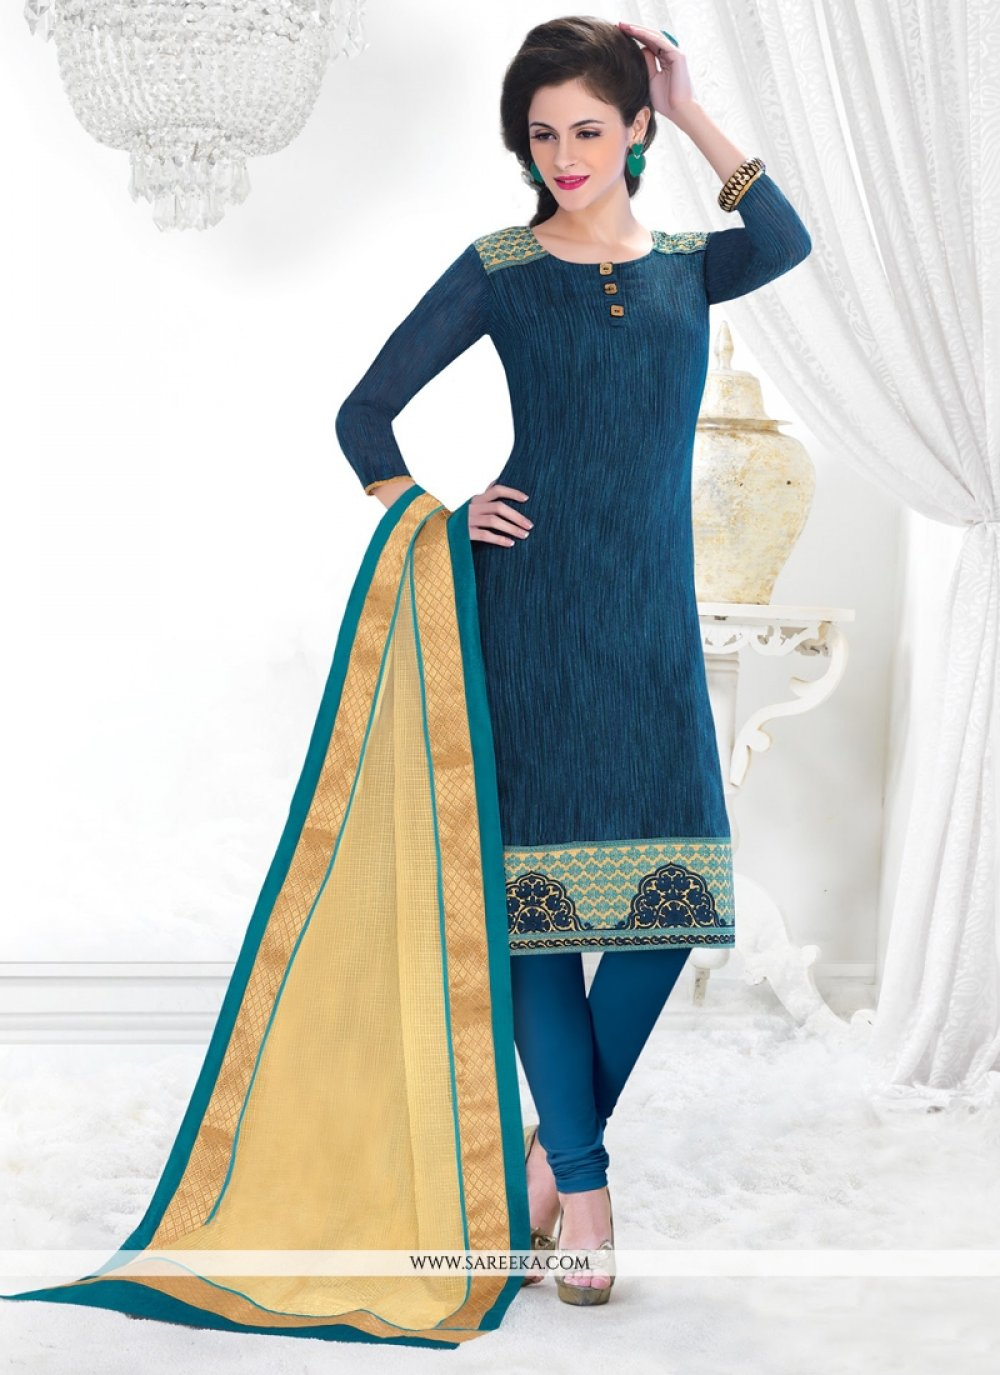 Chanderi Blue Lace Work Churidar Salwar Kameez